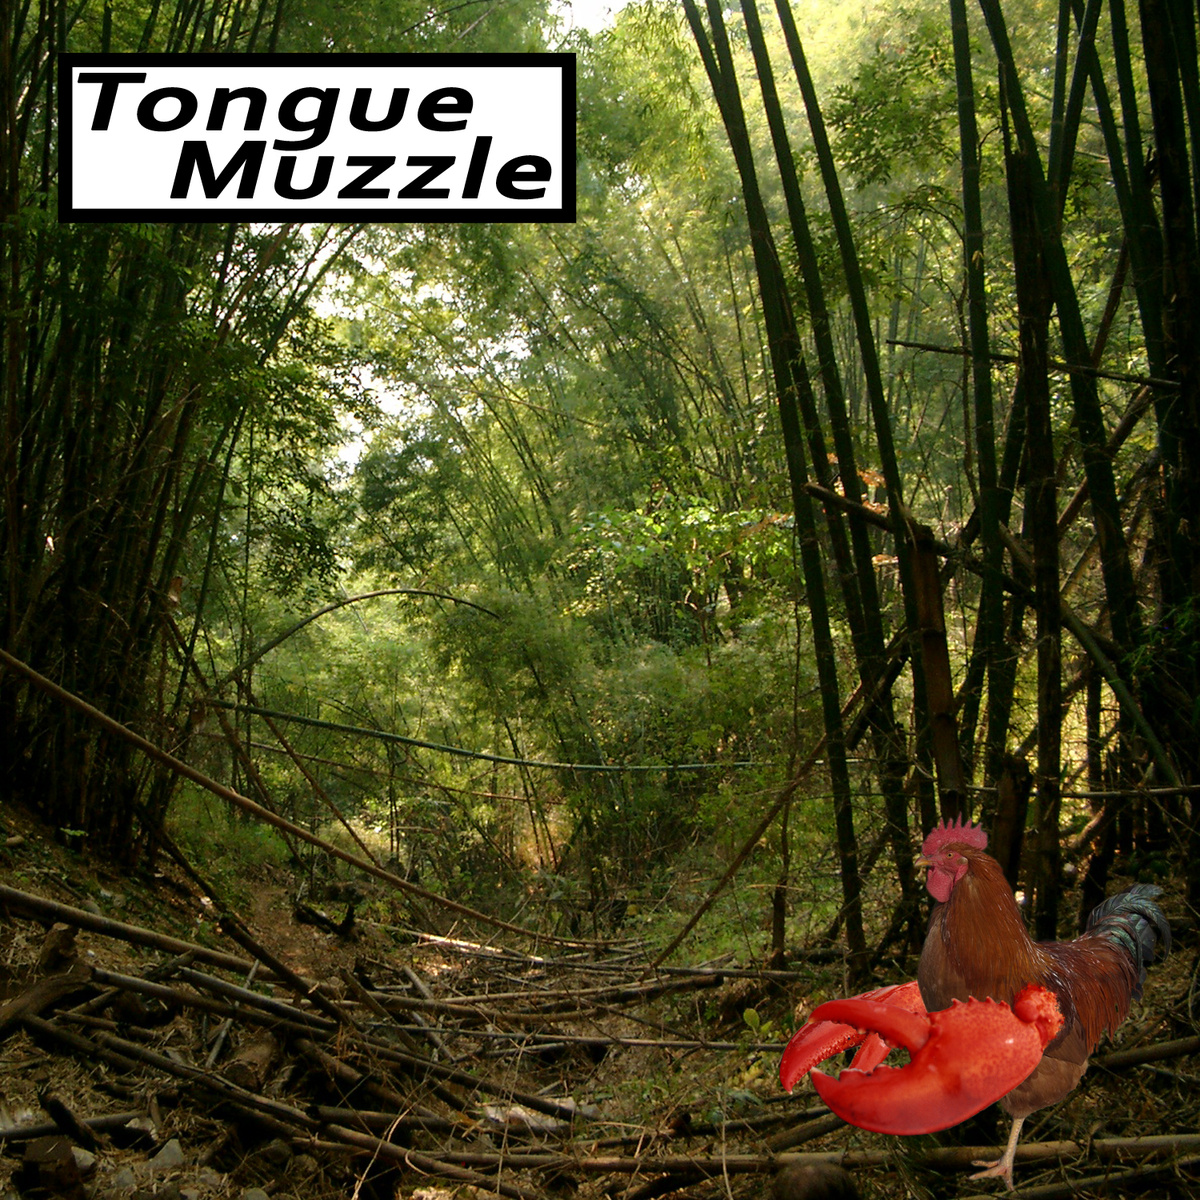 tongue_muzzle_lcaf_cover